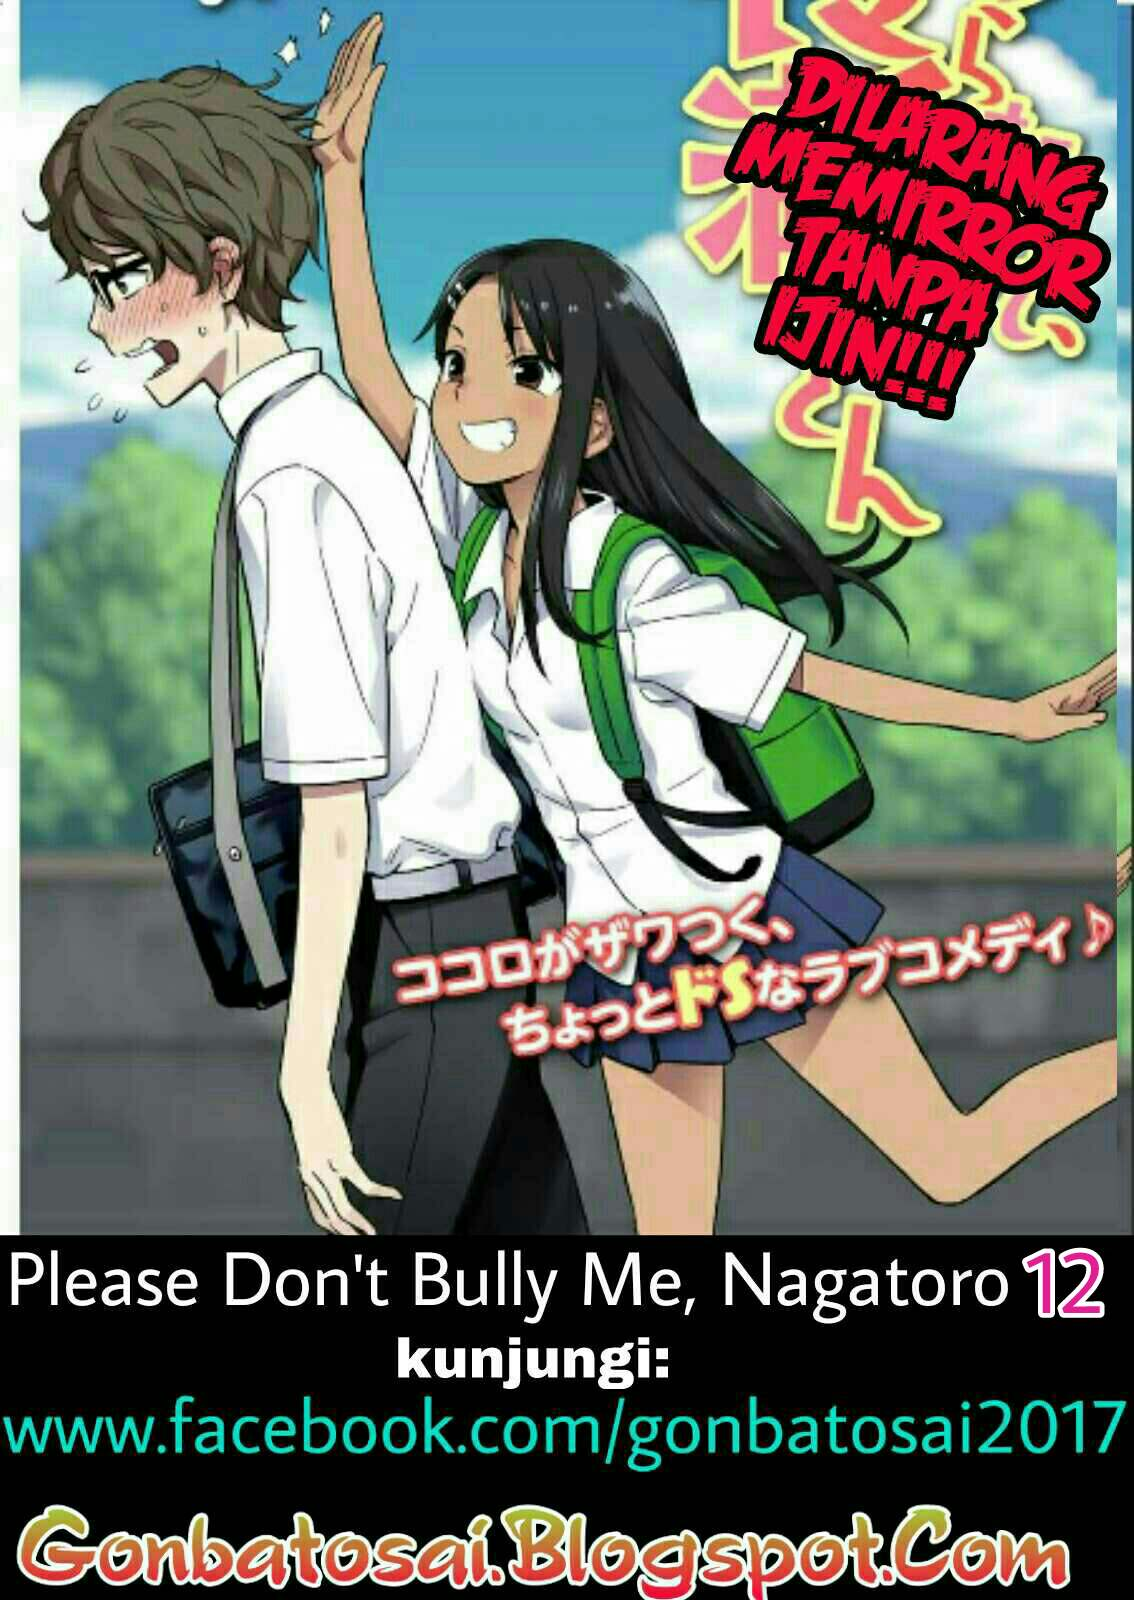 Baca Komik Please don't Bully me Nagatoro Chapter 12 Bahasa Indonesia Komikindo